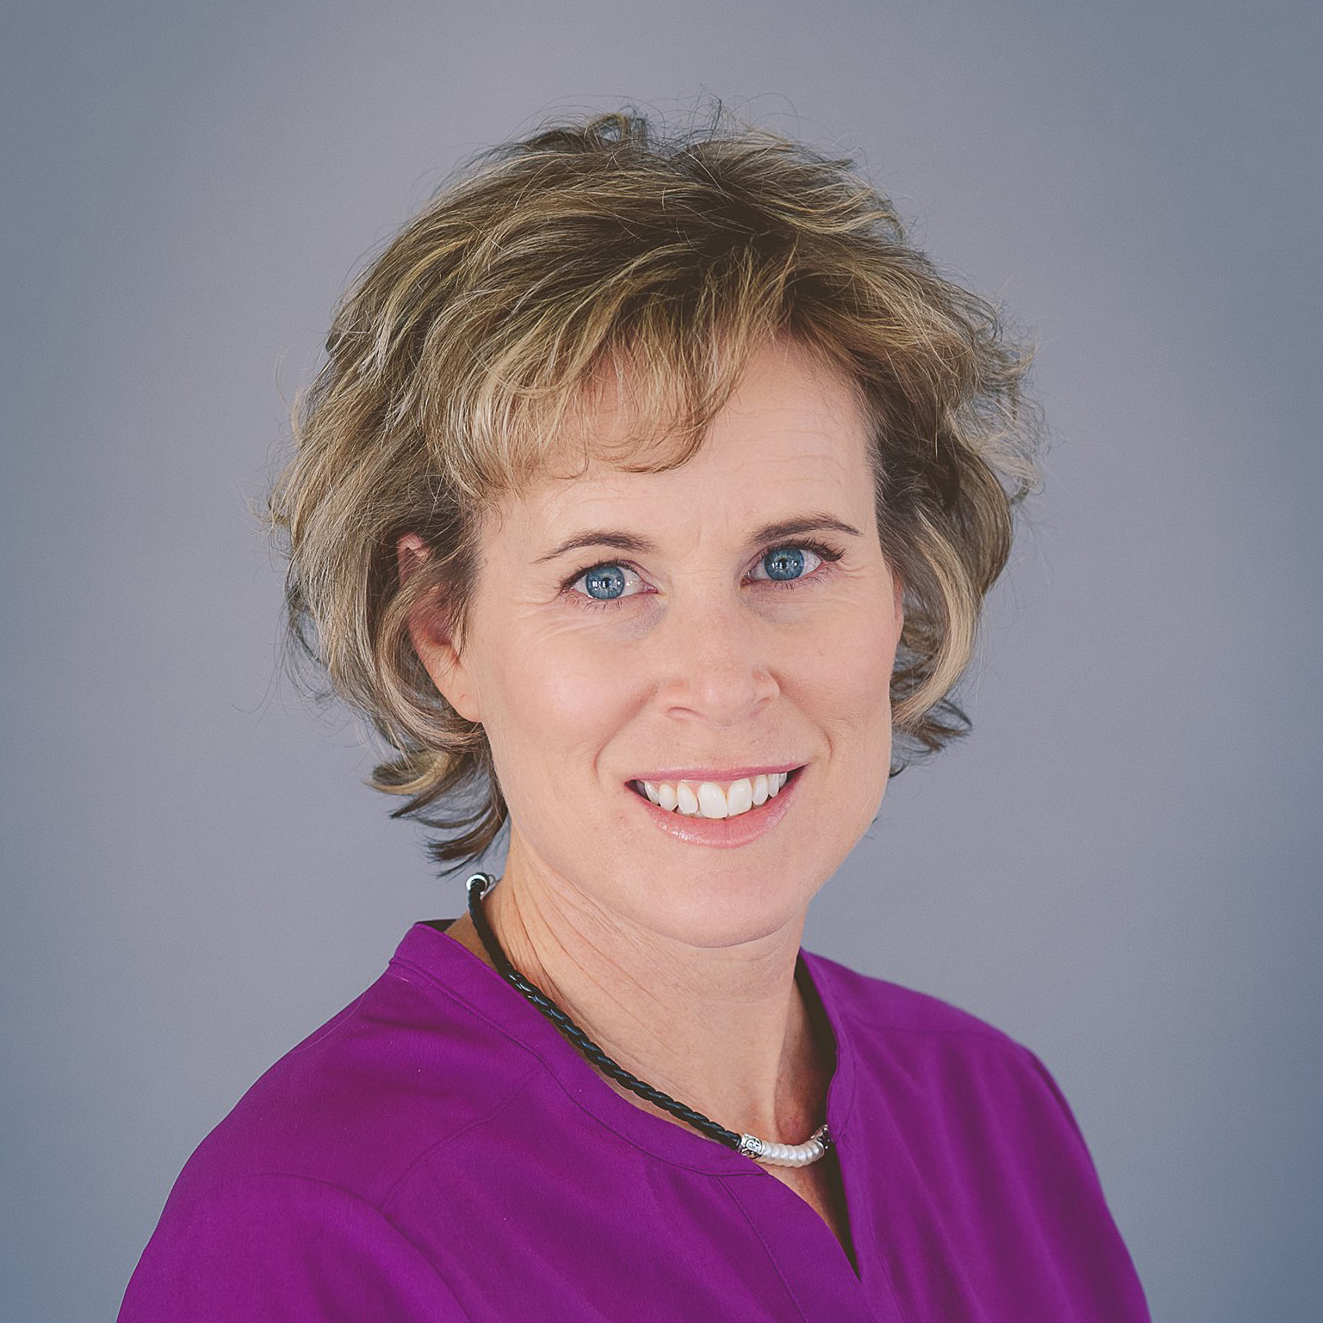 Kara Peterson, Kind Defined Executive Director